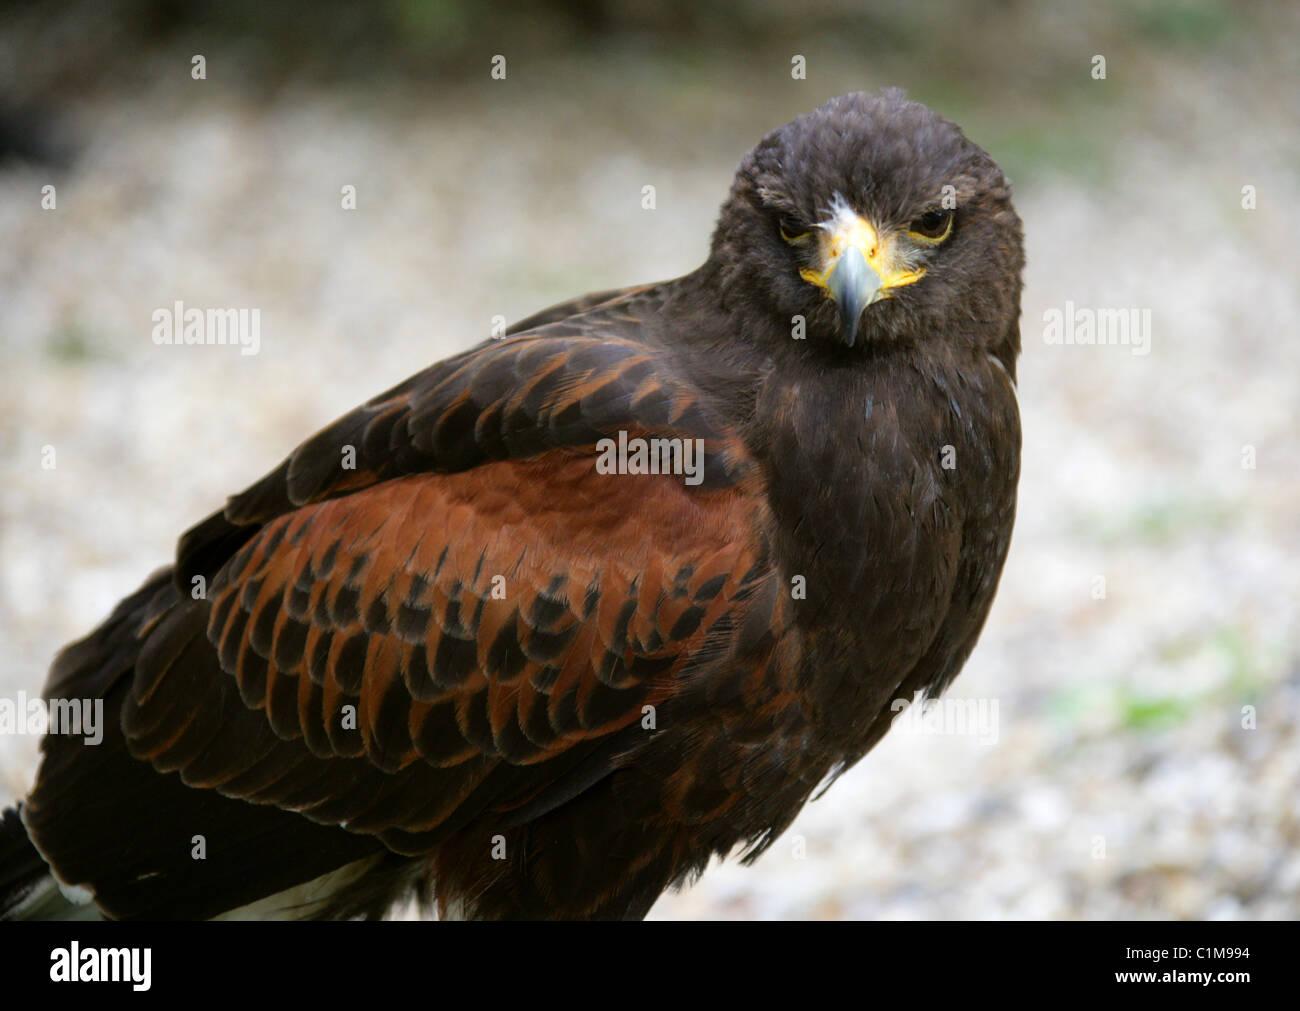 Harris Hawk, Parabuteo unicinctus, Accipitridae. Captive Bird. - Stock Image